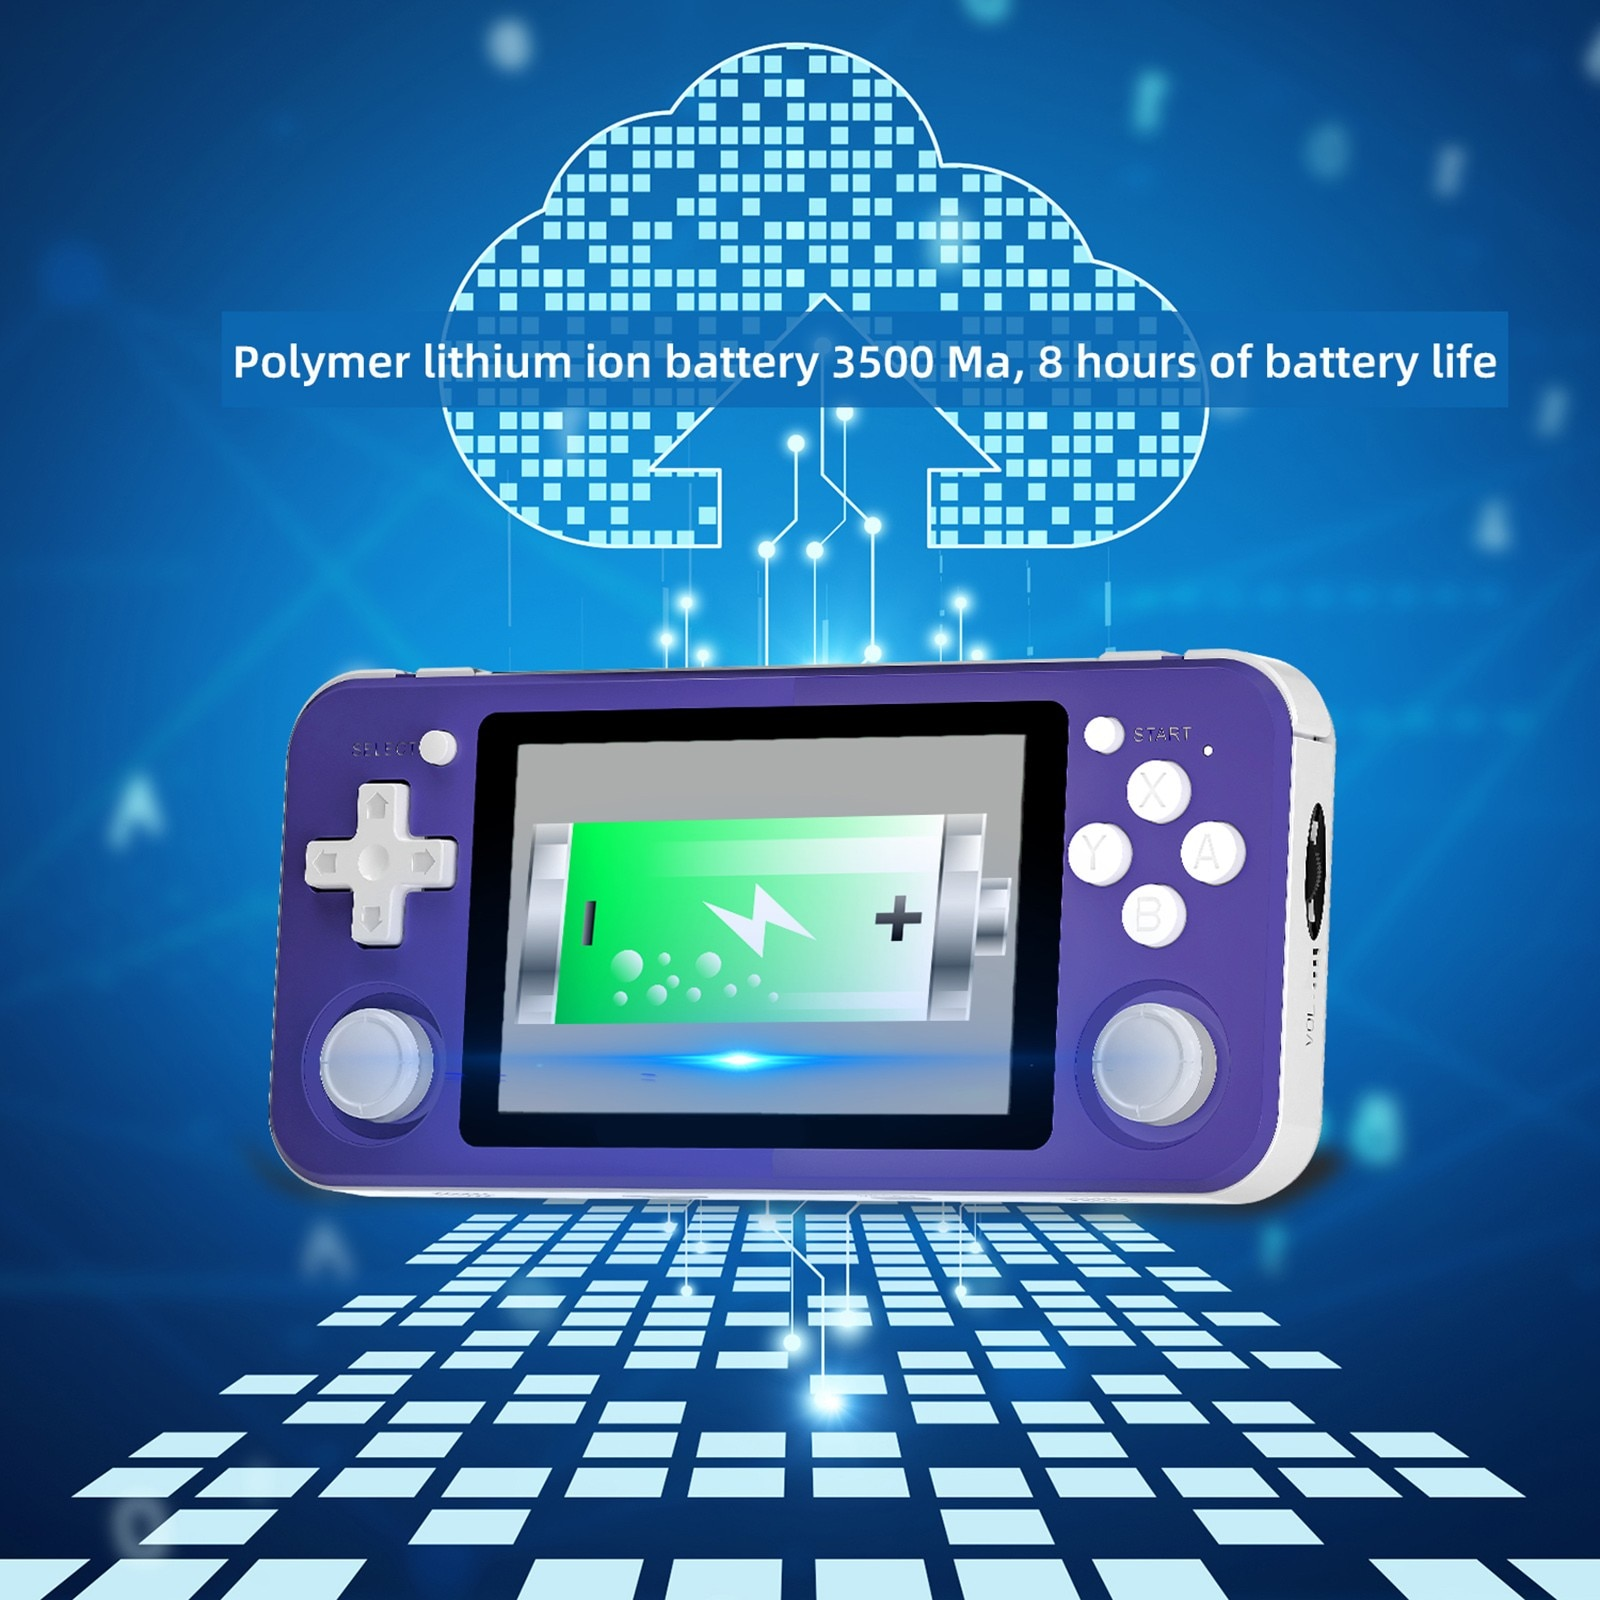 Rg351p Handheld Spielkonsole 3,5-zoll Ips Bildschirm Dual Rocker Linux System Pc Shell Ps1 N64 Spiele kinder geschenke #3